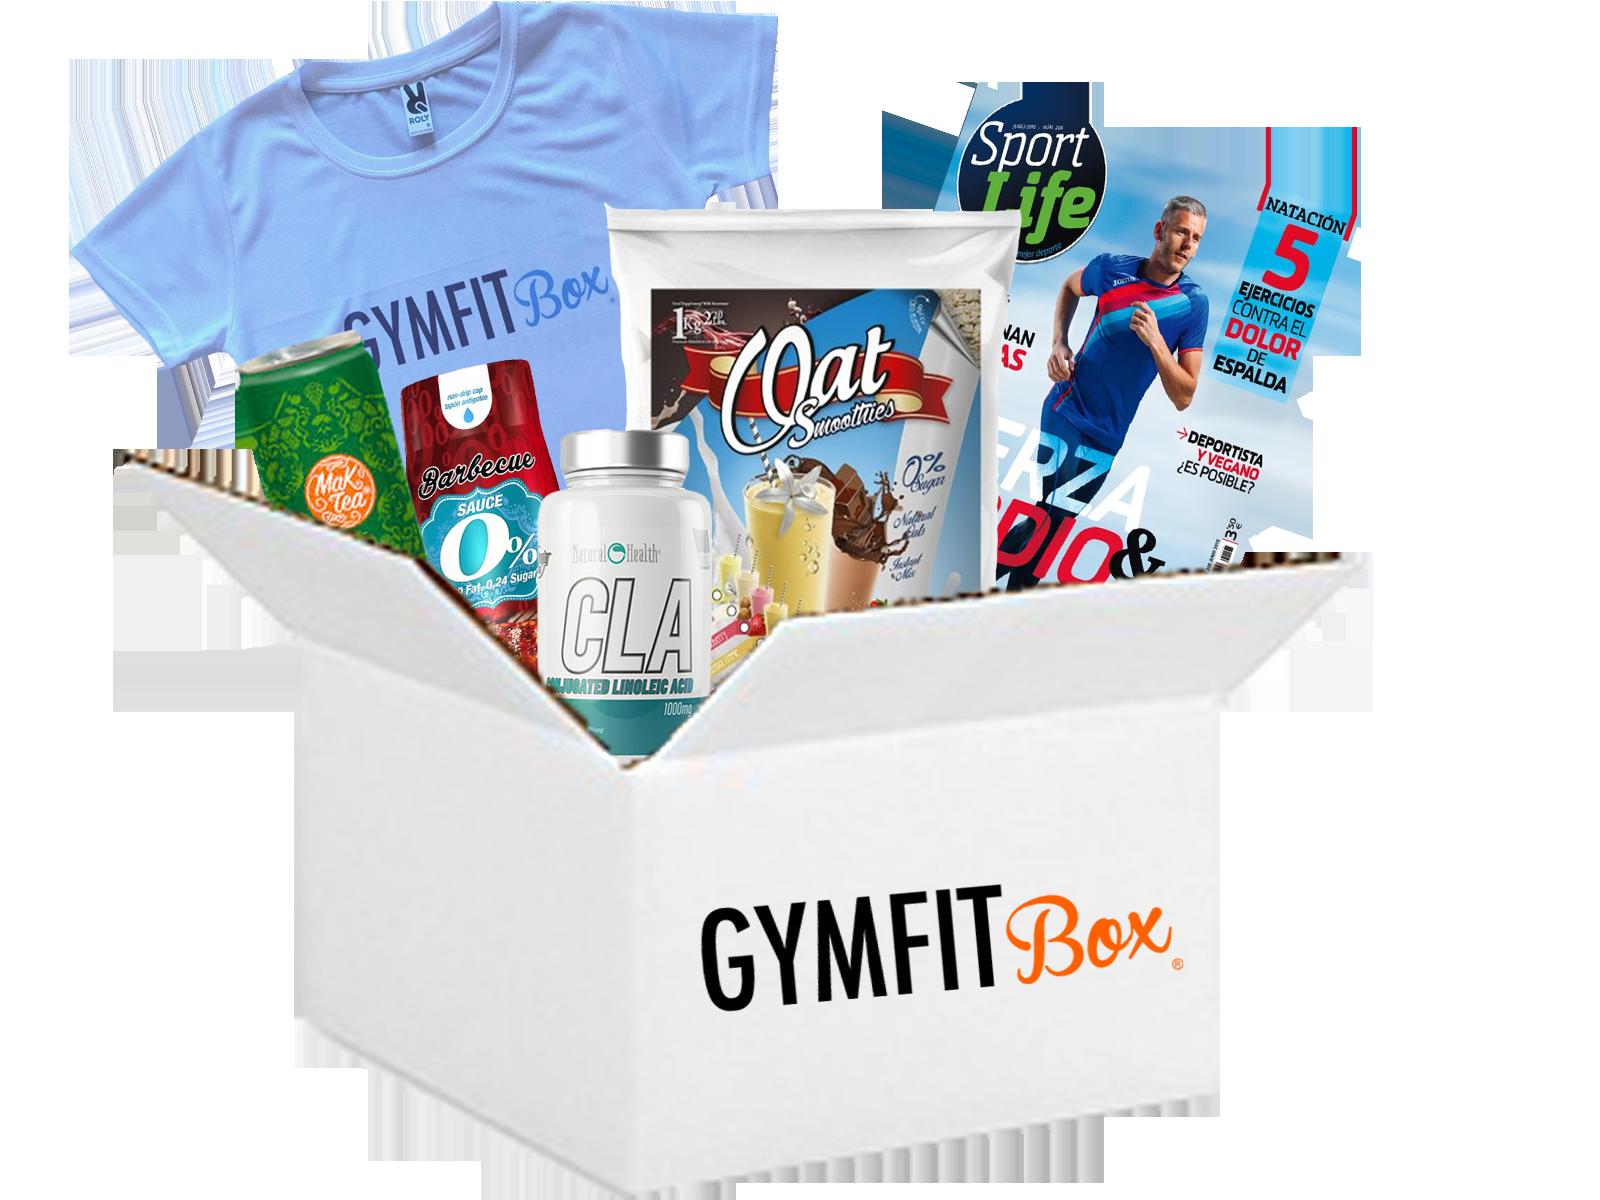 Gymfitbox Junio 2106